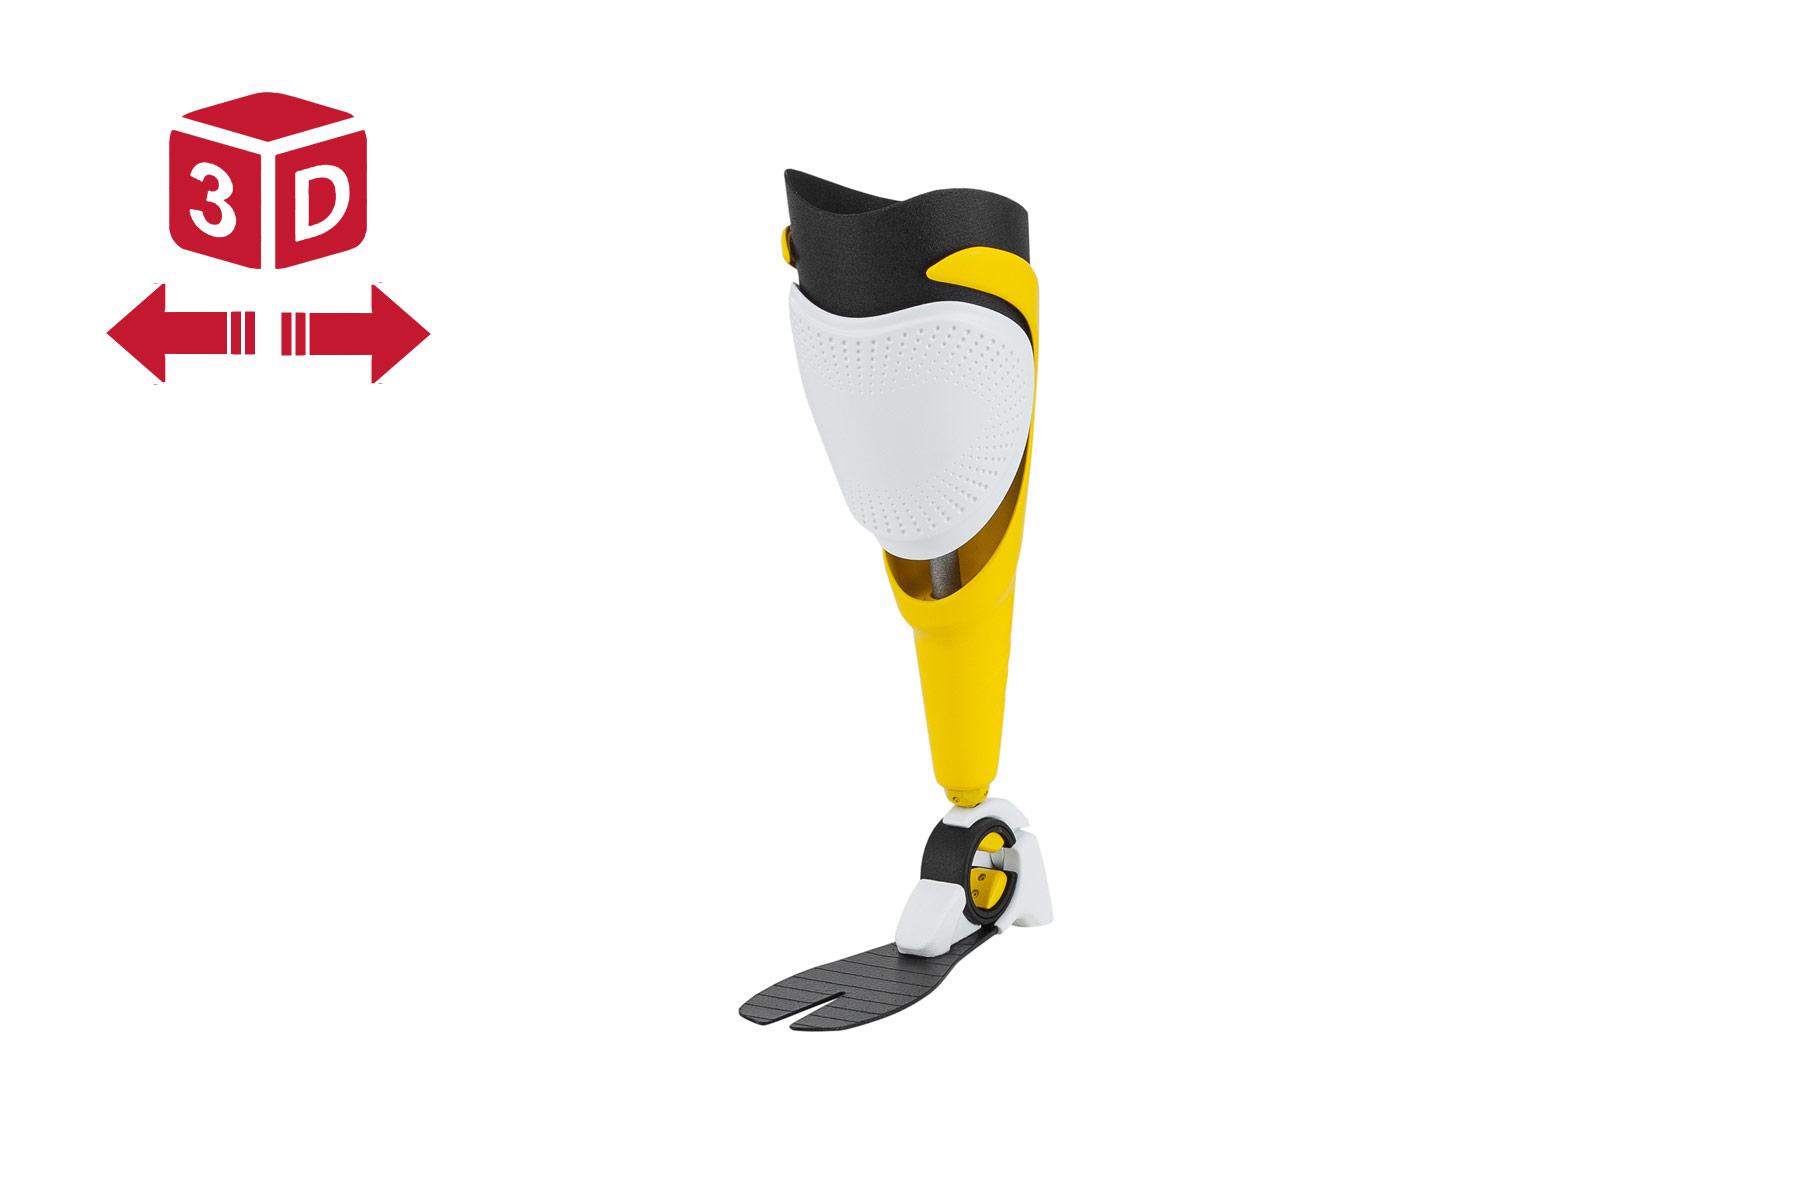 3D Druck-SLA-3, Protese-Prototyp Medzinaltechnik